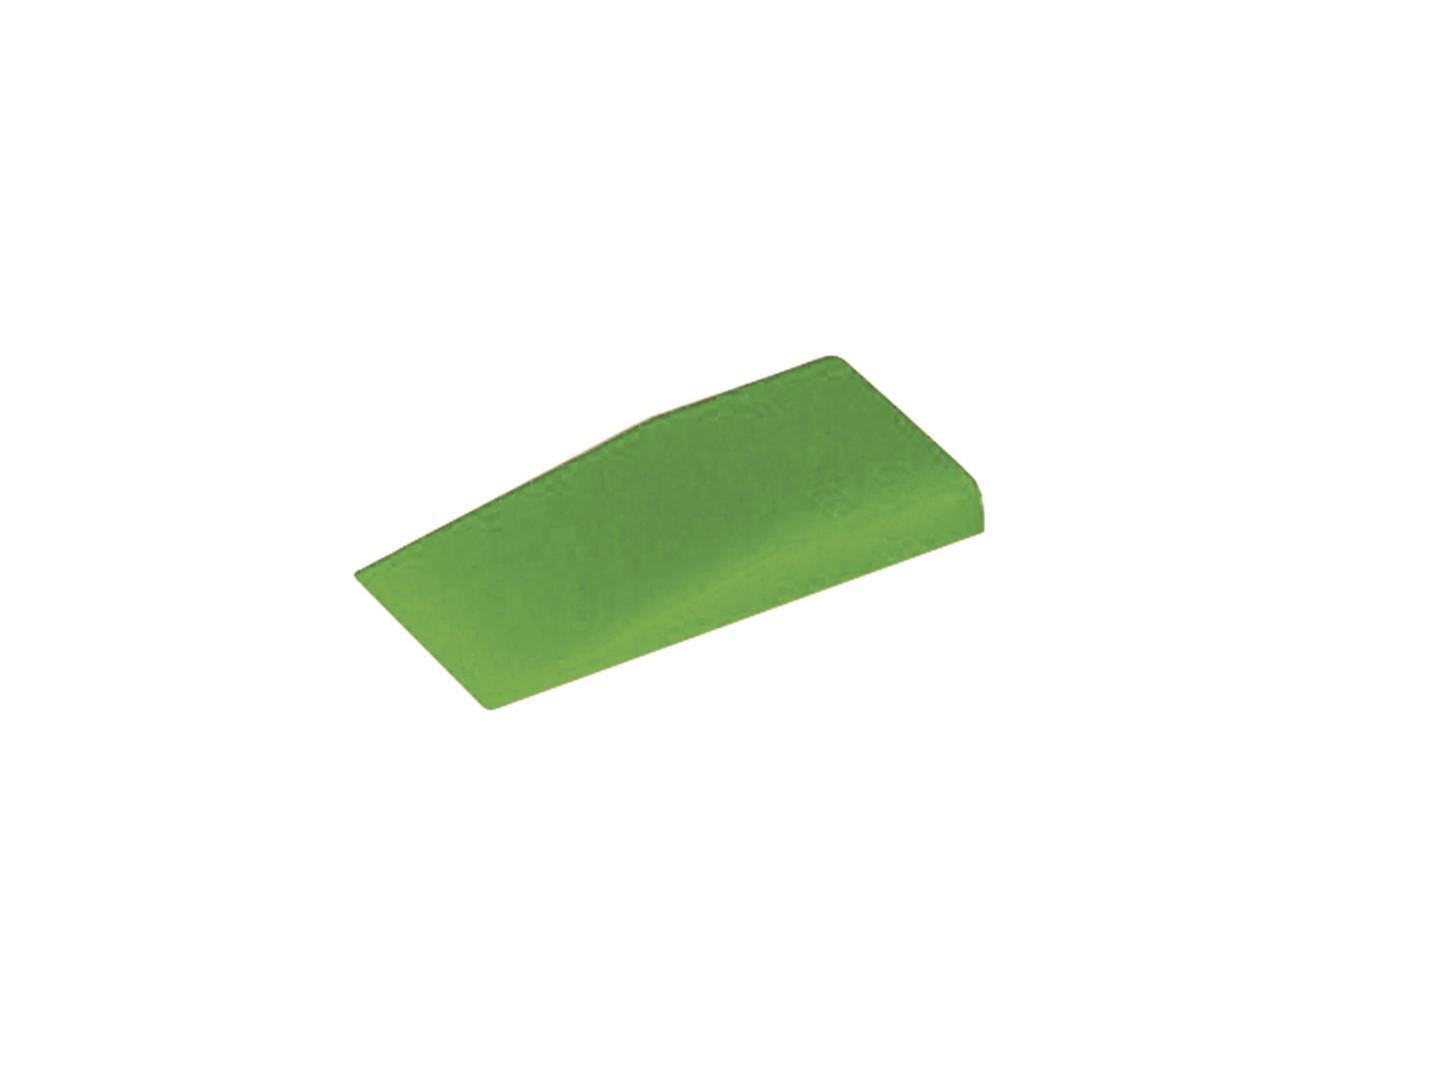 Cale vert 40 23x5 ABS